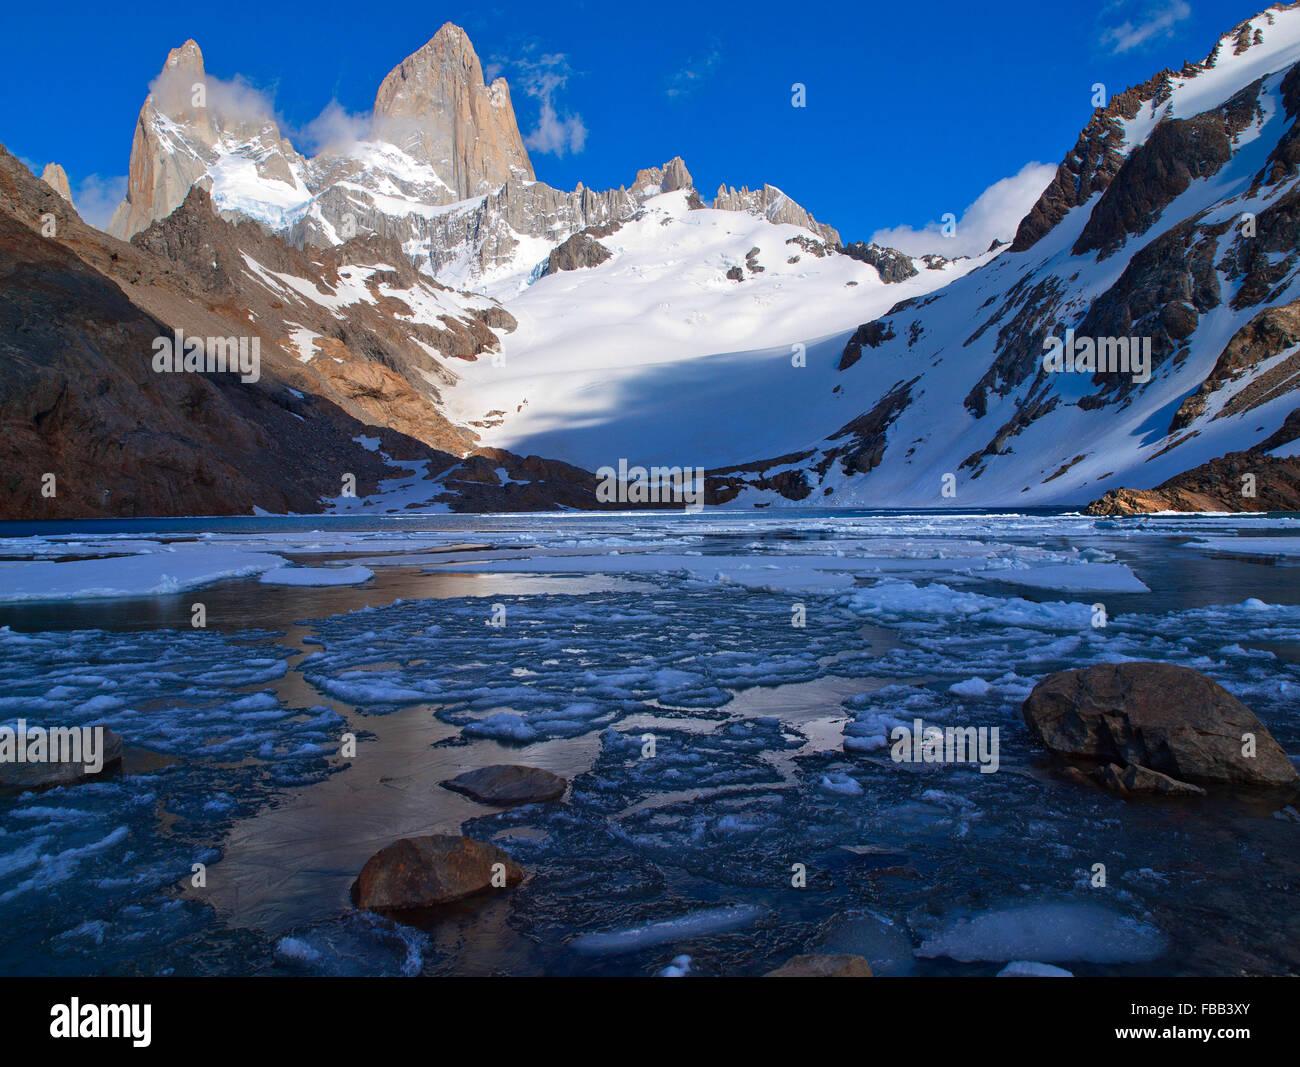 Laguna de los Tres, Fitz Roy Patagonie Photo Stock